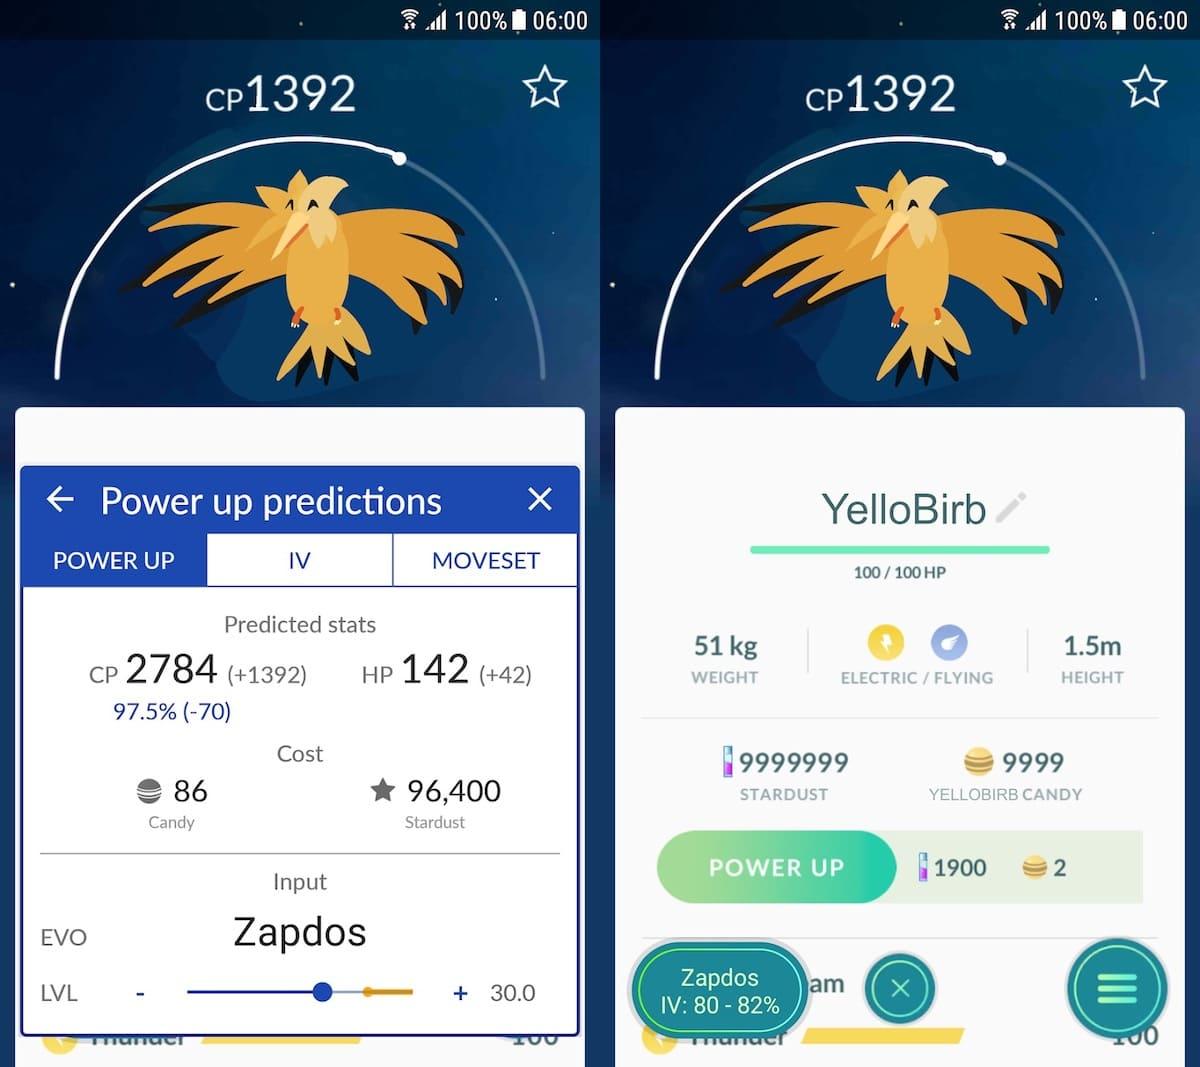 Calculadora IV Pokémon GO: 5 apps para calcular el IV de Pokémon